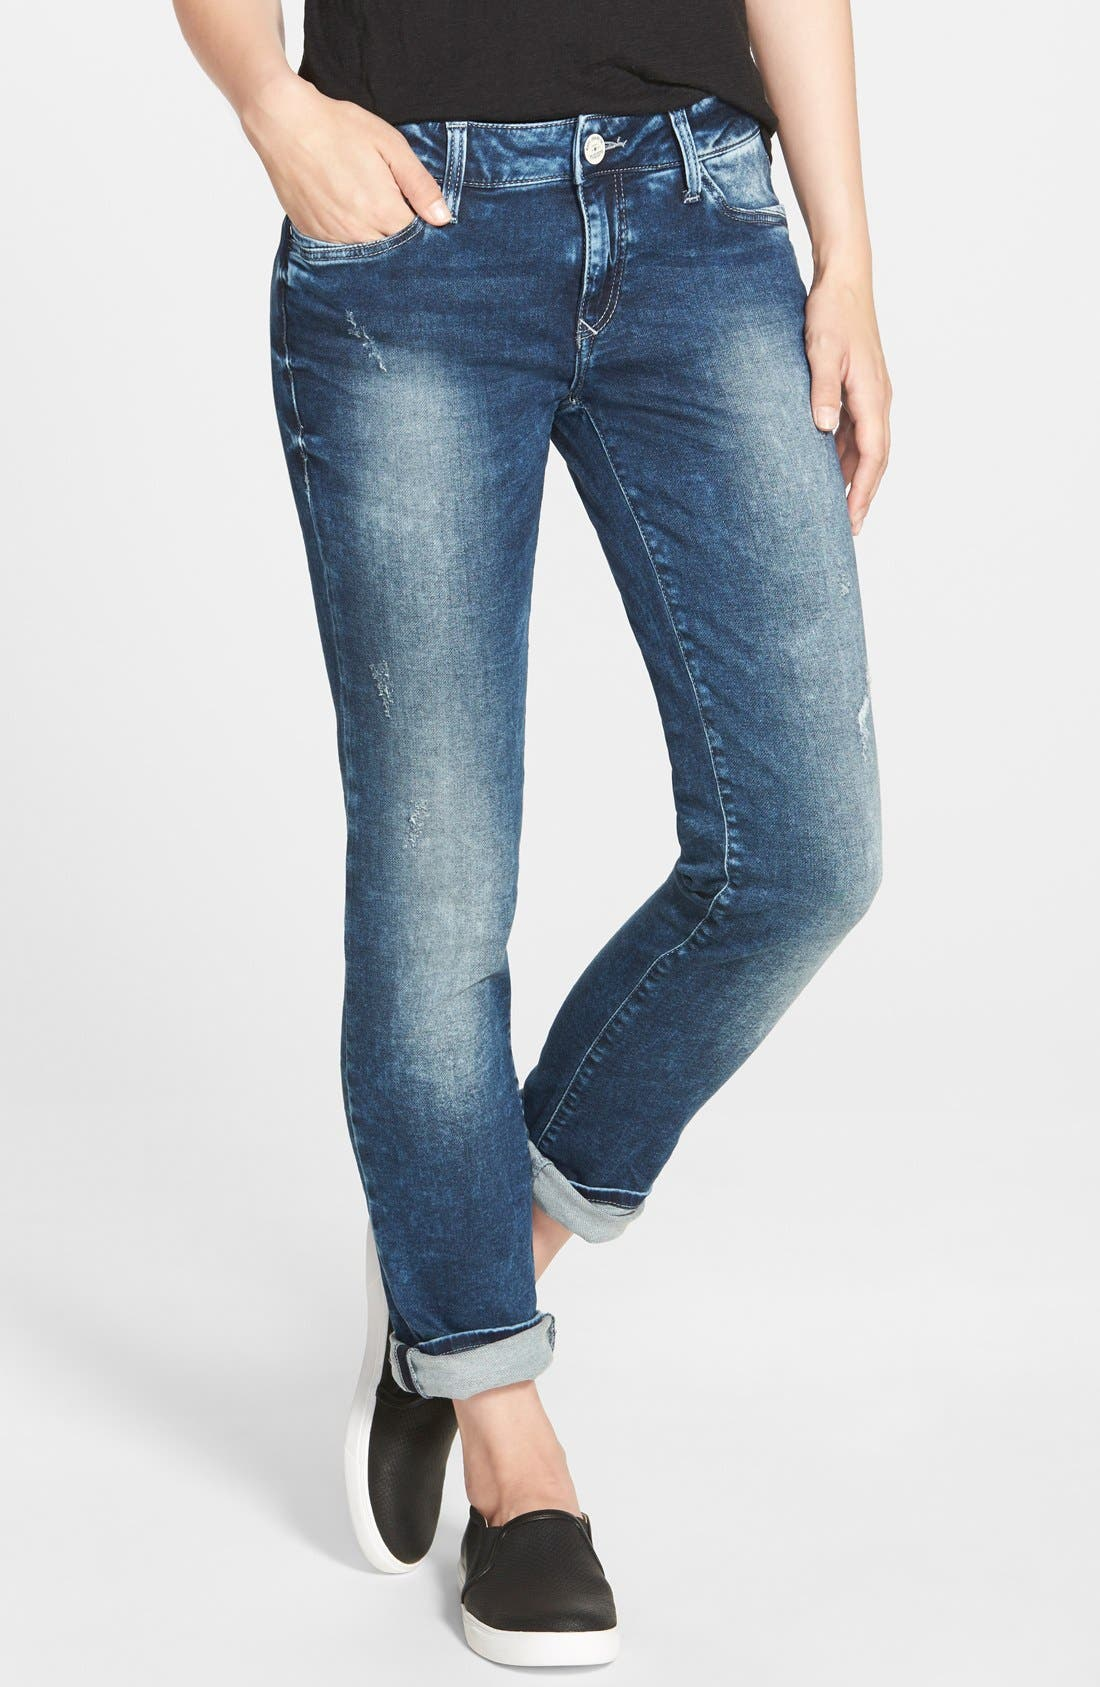 Alternate Image 1 Selected - Mavi Jeans 'Emma' Distressed Boyfriend Slim Jeans (Mid Sporty)